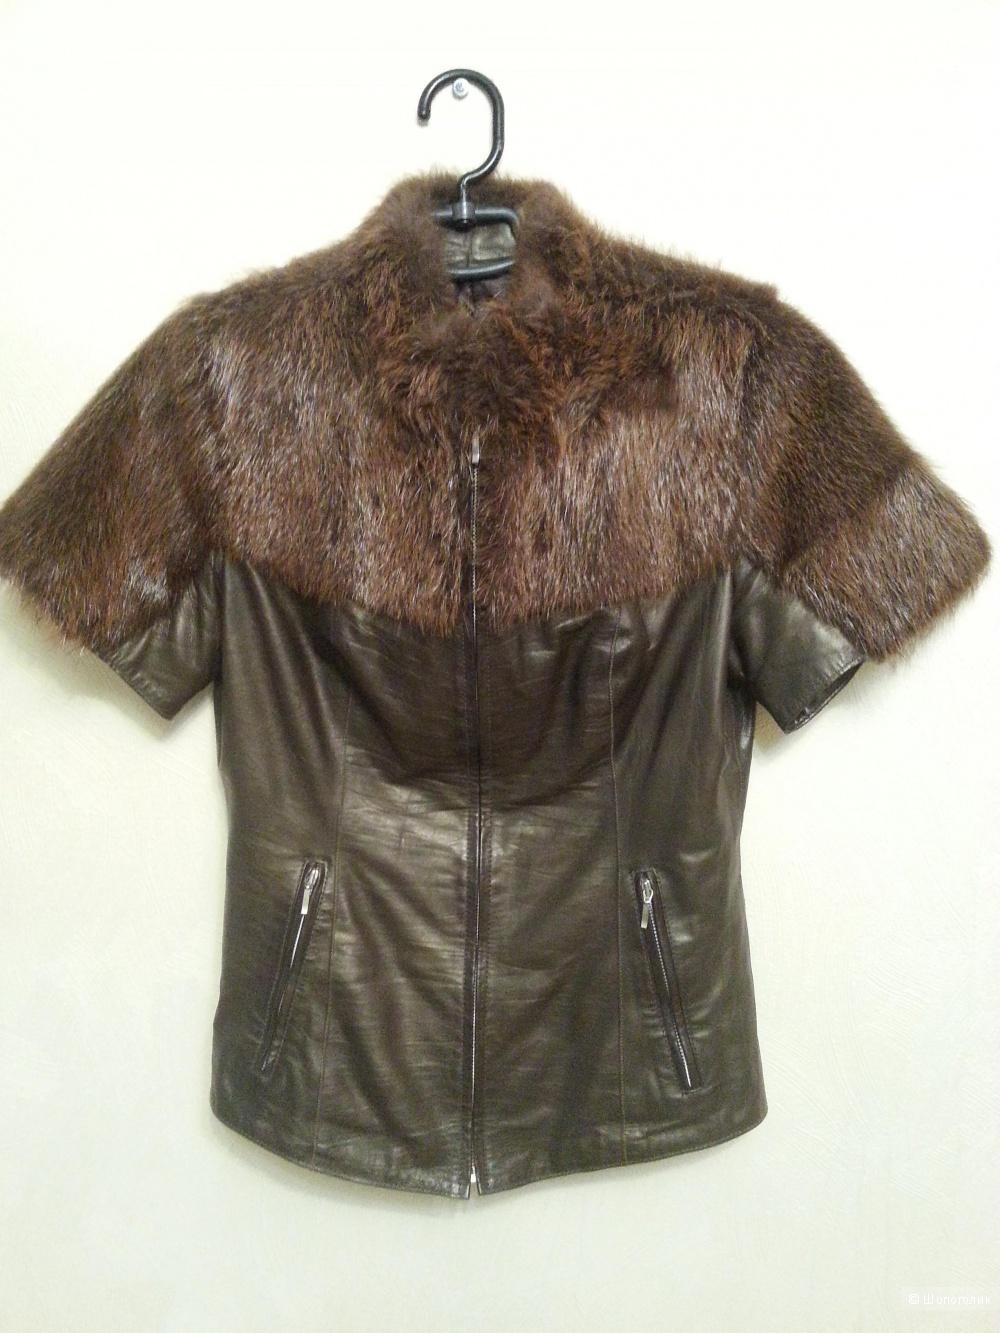 Курточка Кожа с мехом, размер 40-42 (XS)